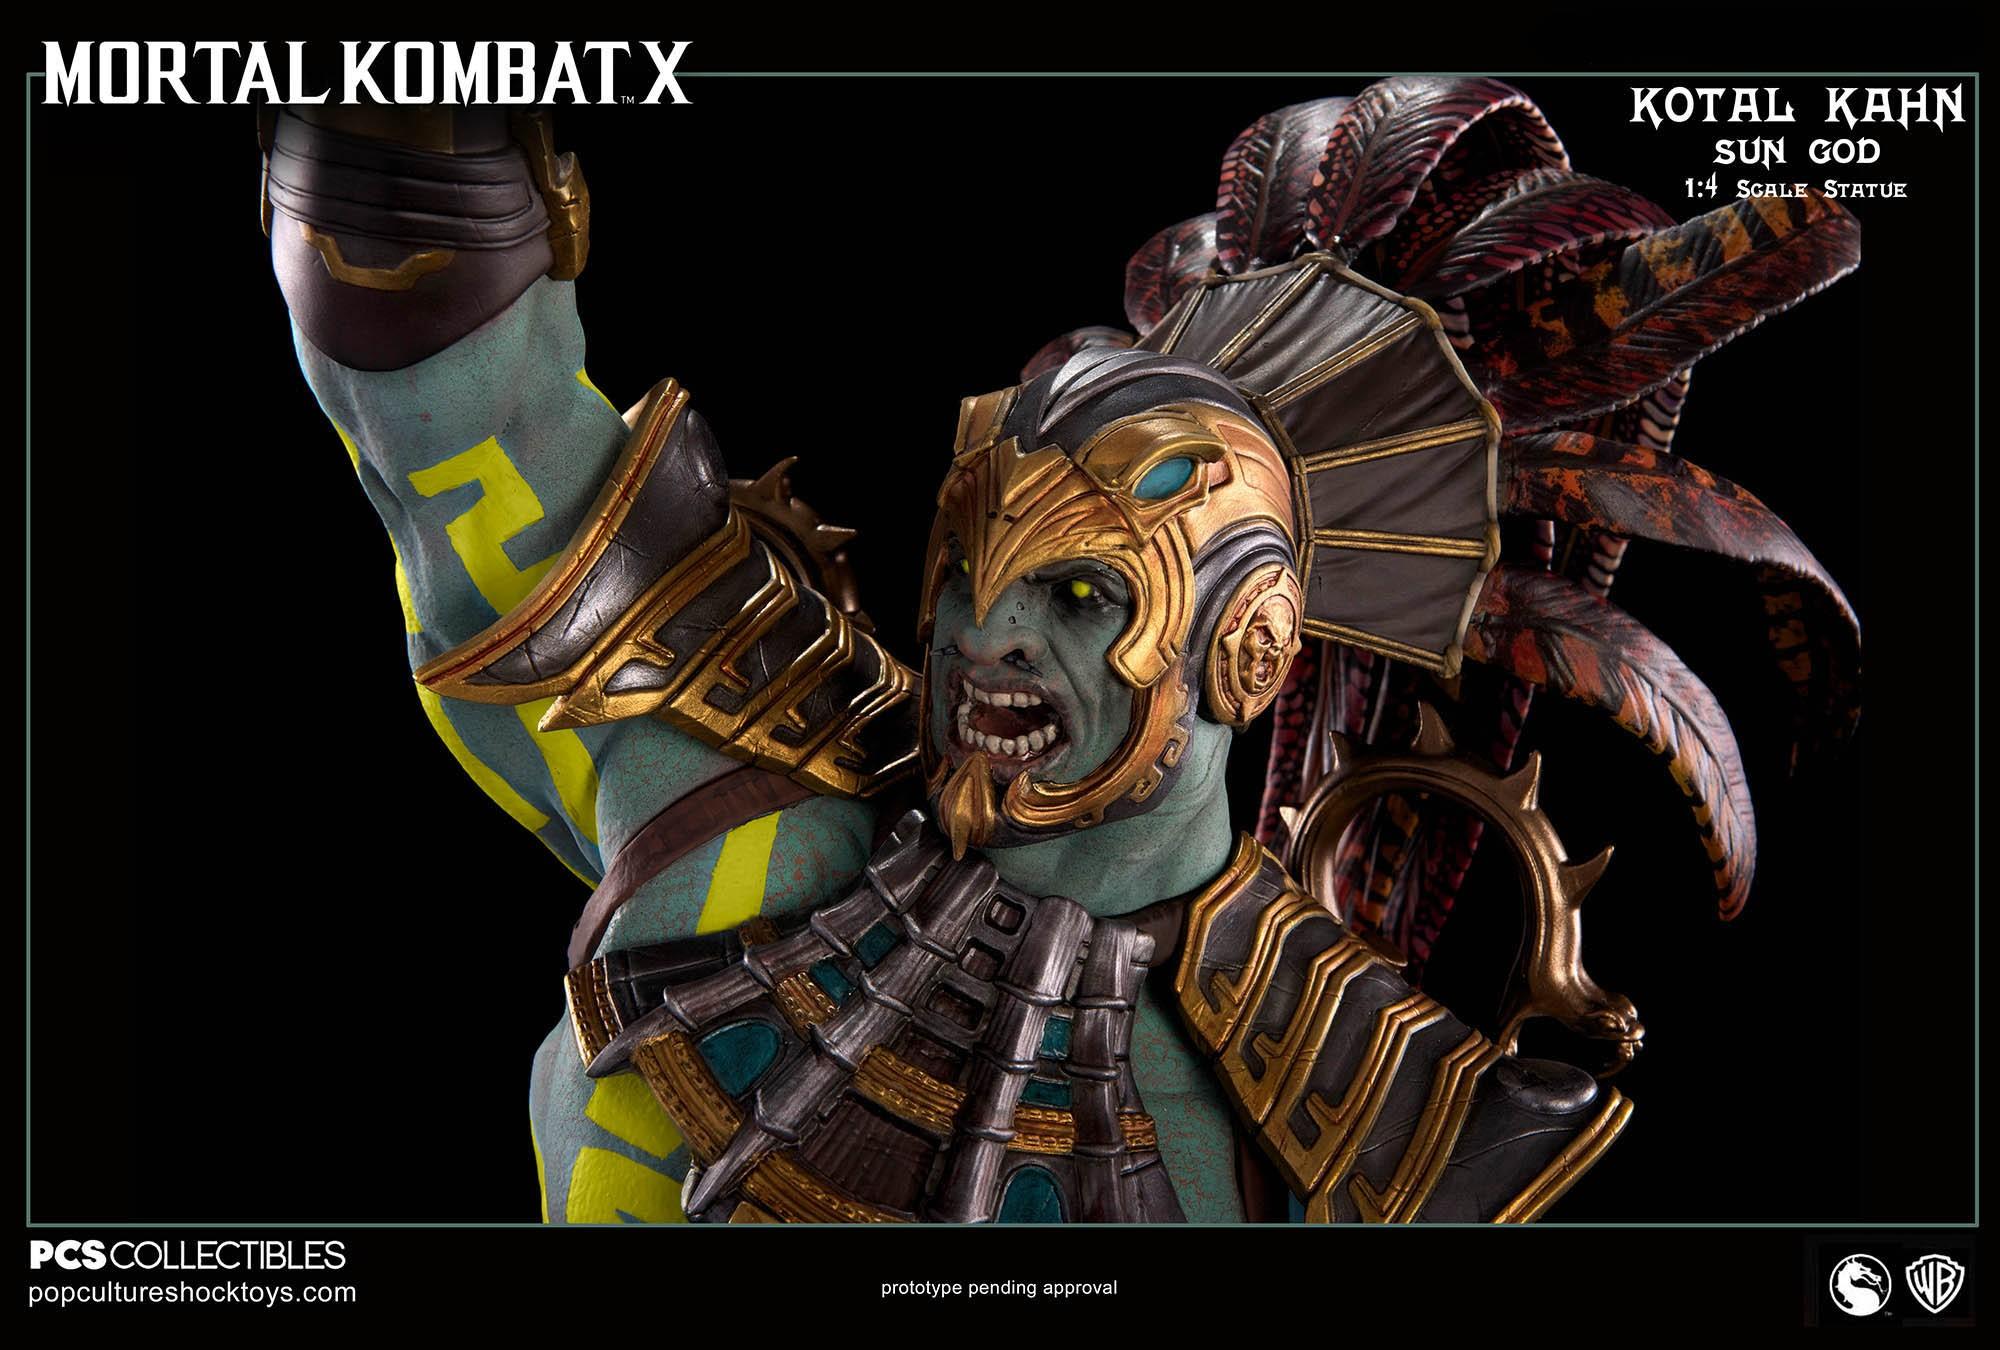 [Pop Culture Shock] Mortal Kombat X: Kotal Kahn 1:4 scale PCS-Kotal-Kahn-Sun-God-026